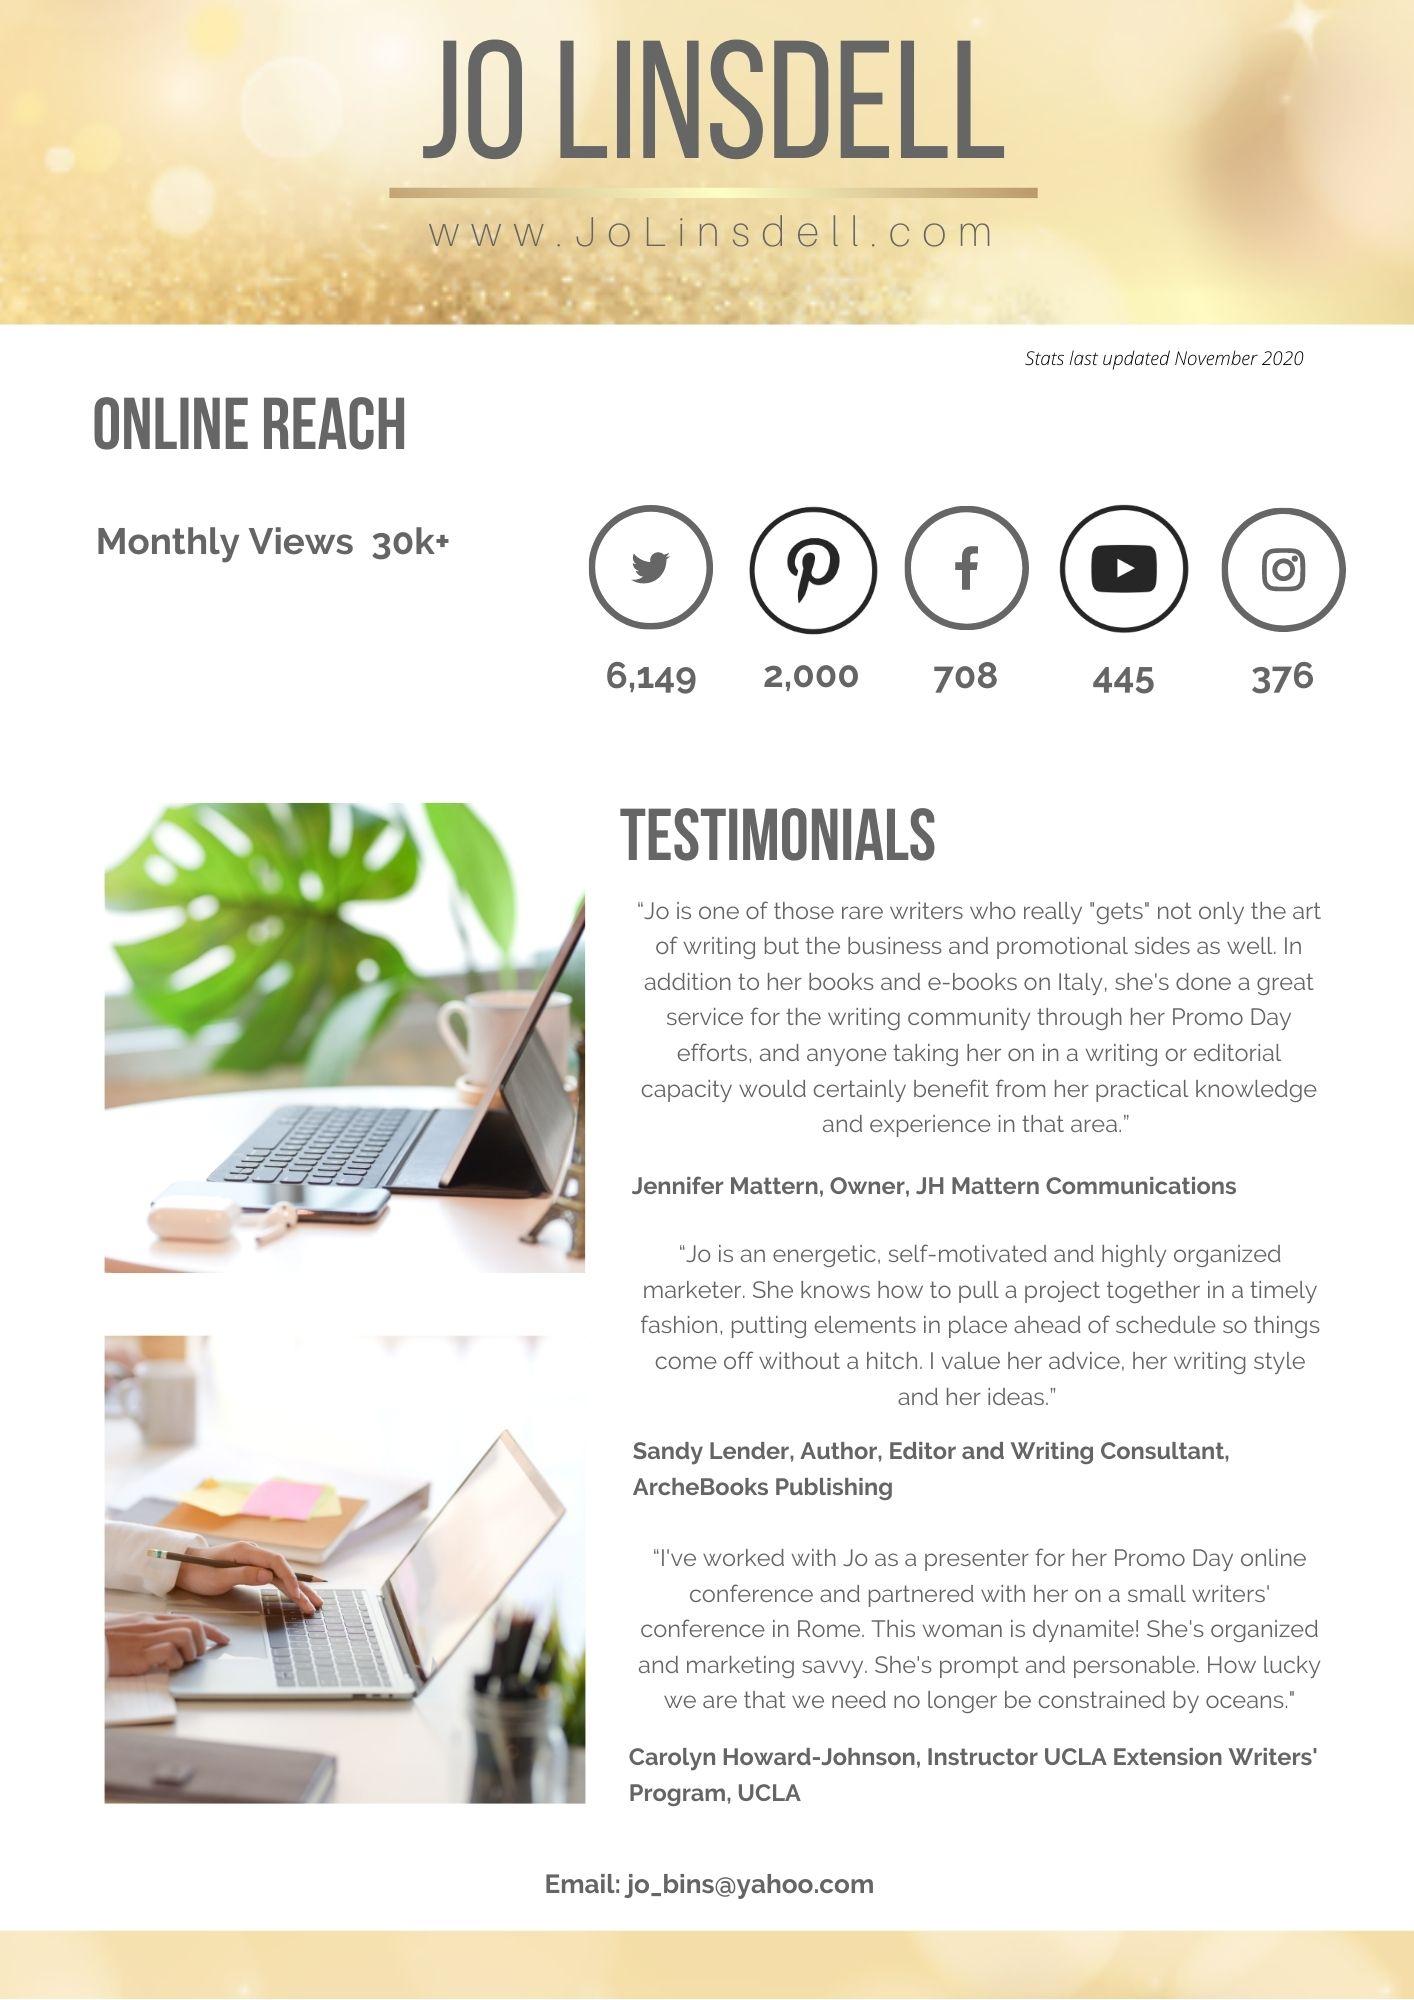 Jo Linsdell Media Kit (last updated November 2020)